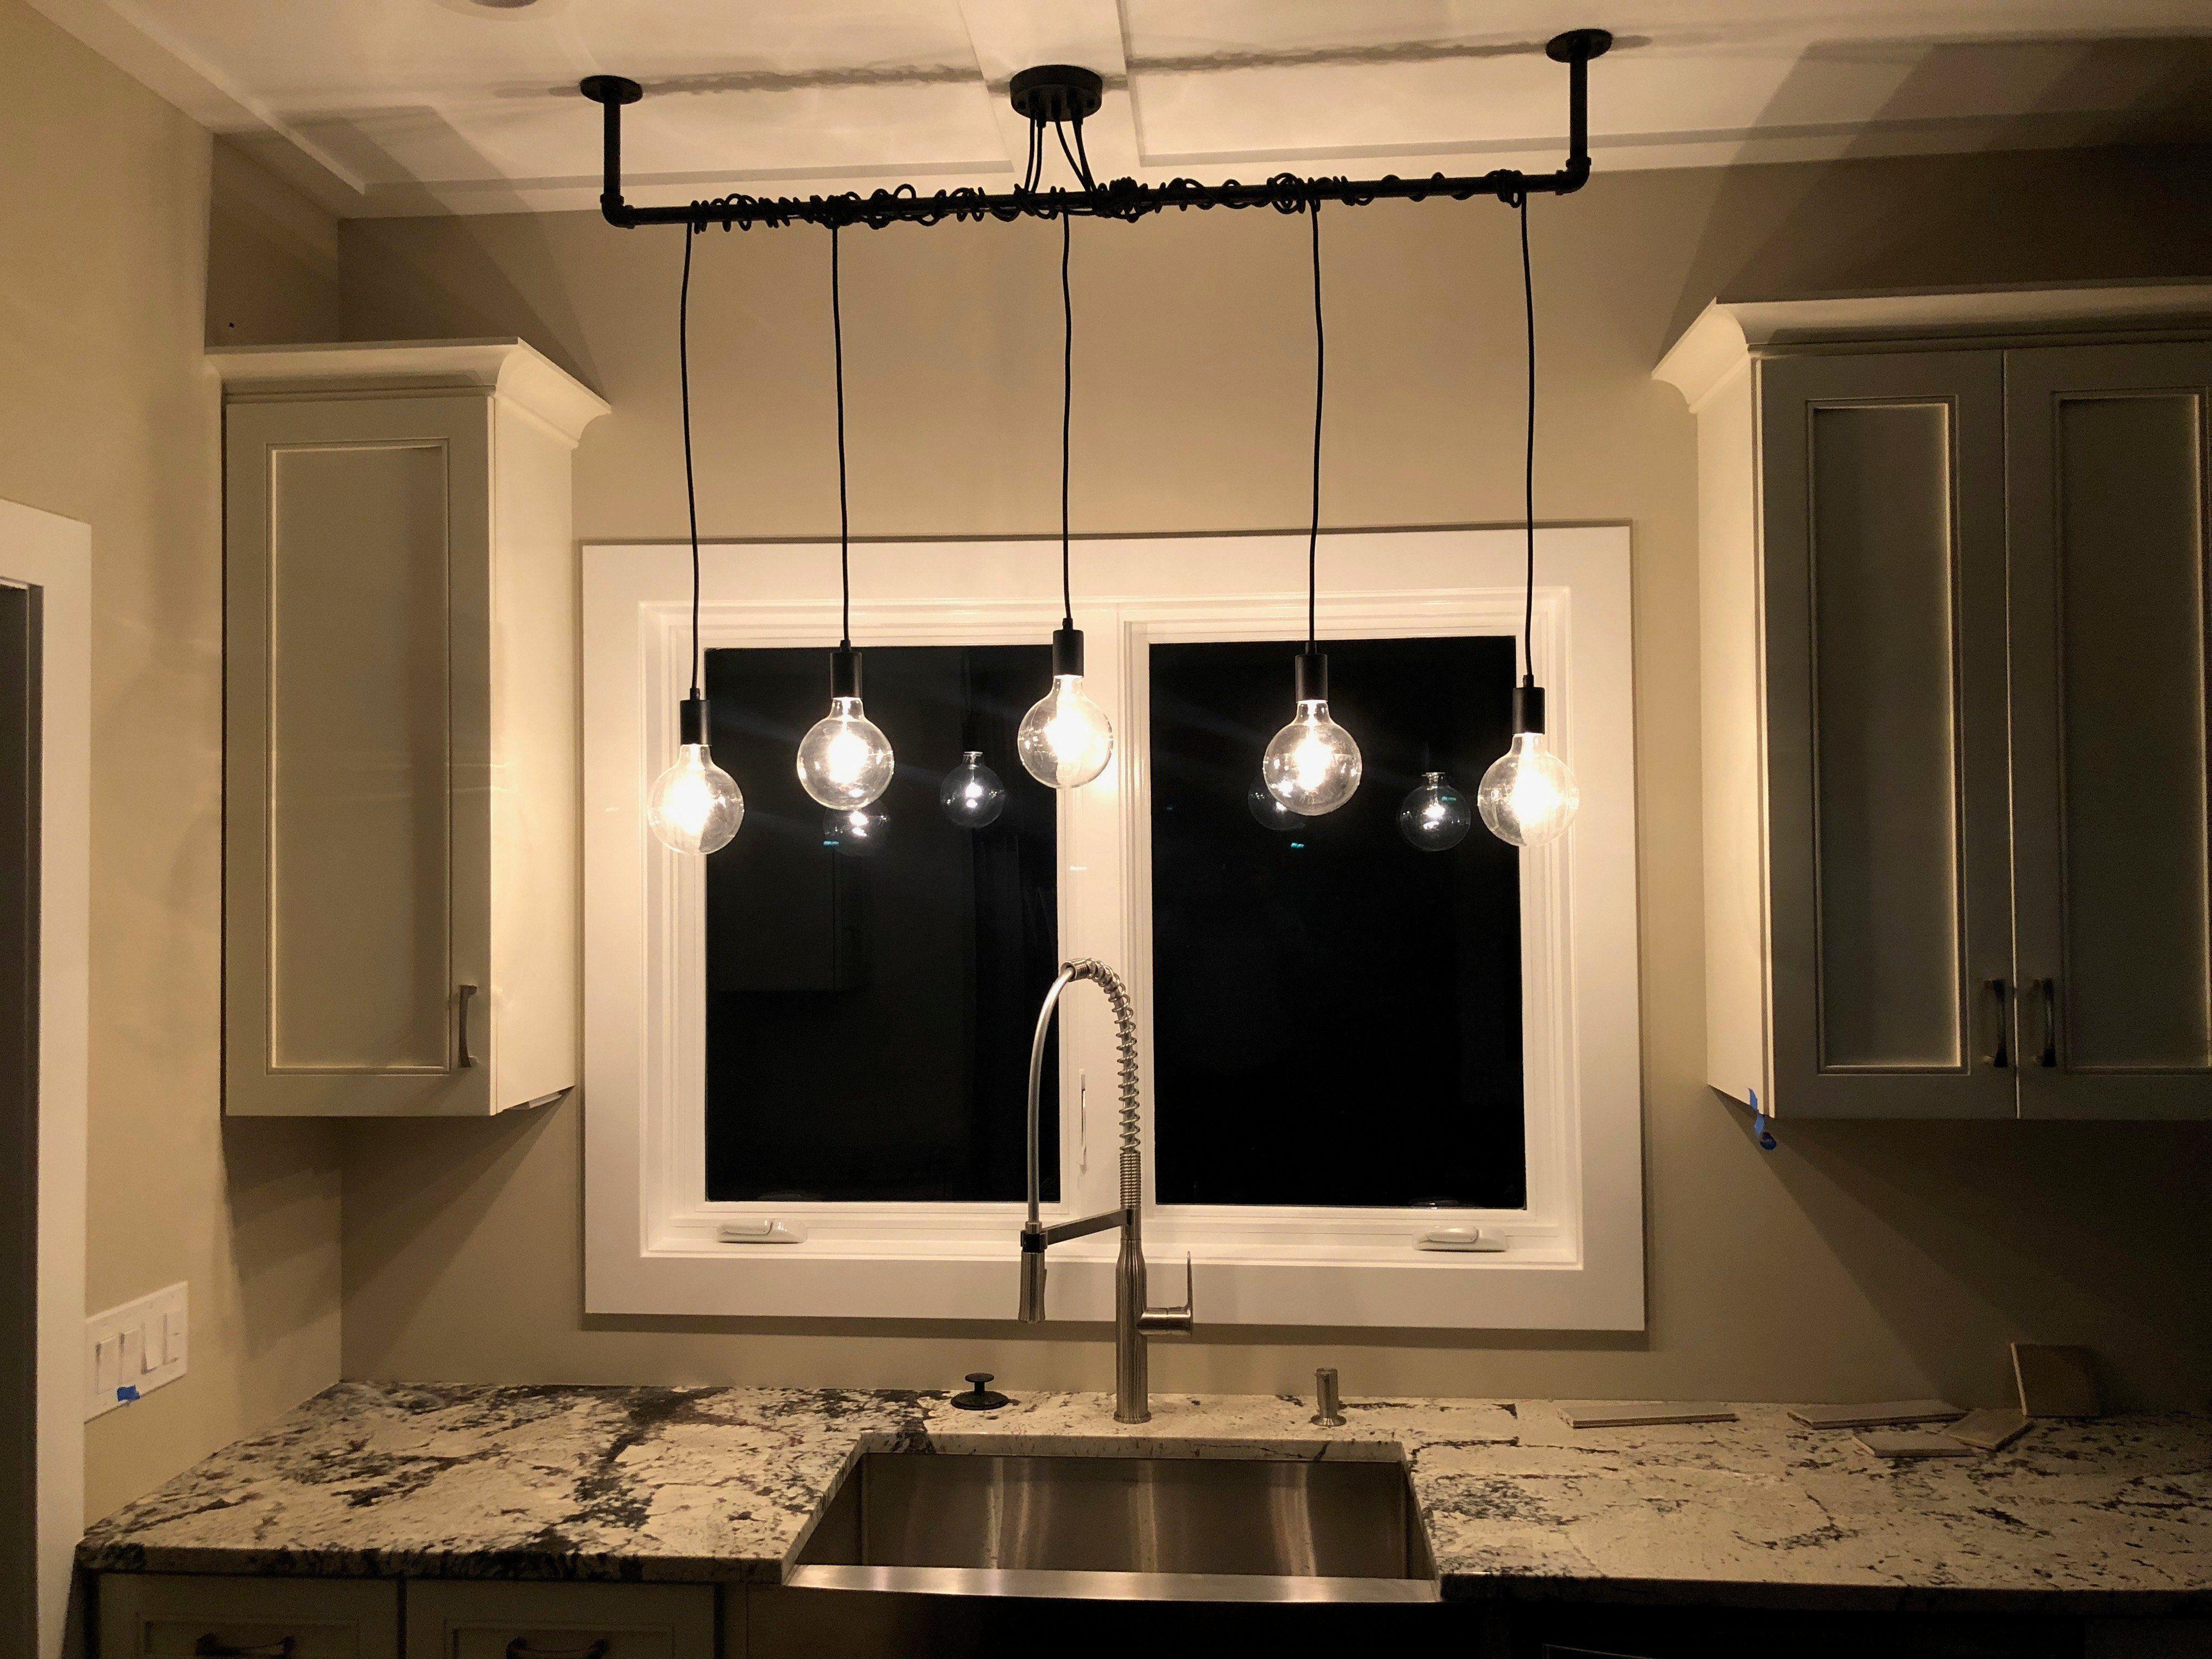 Modern Kitchen Lighting Industrial Lighting Pendant Lights Over Sink Hangout Lighting Sink Pendant Dining Chandelier Sink Pendant Lights